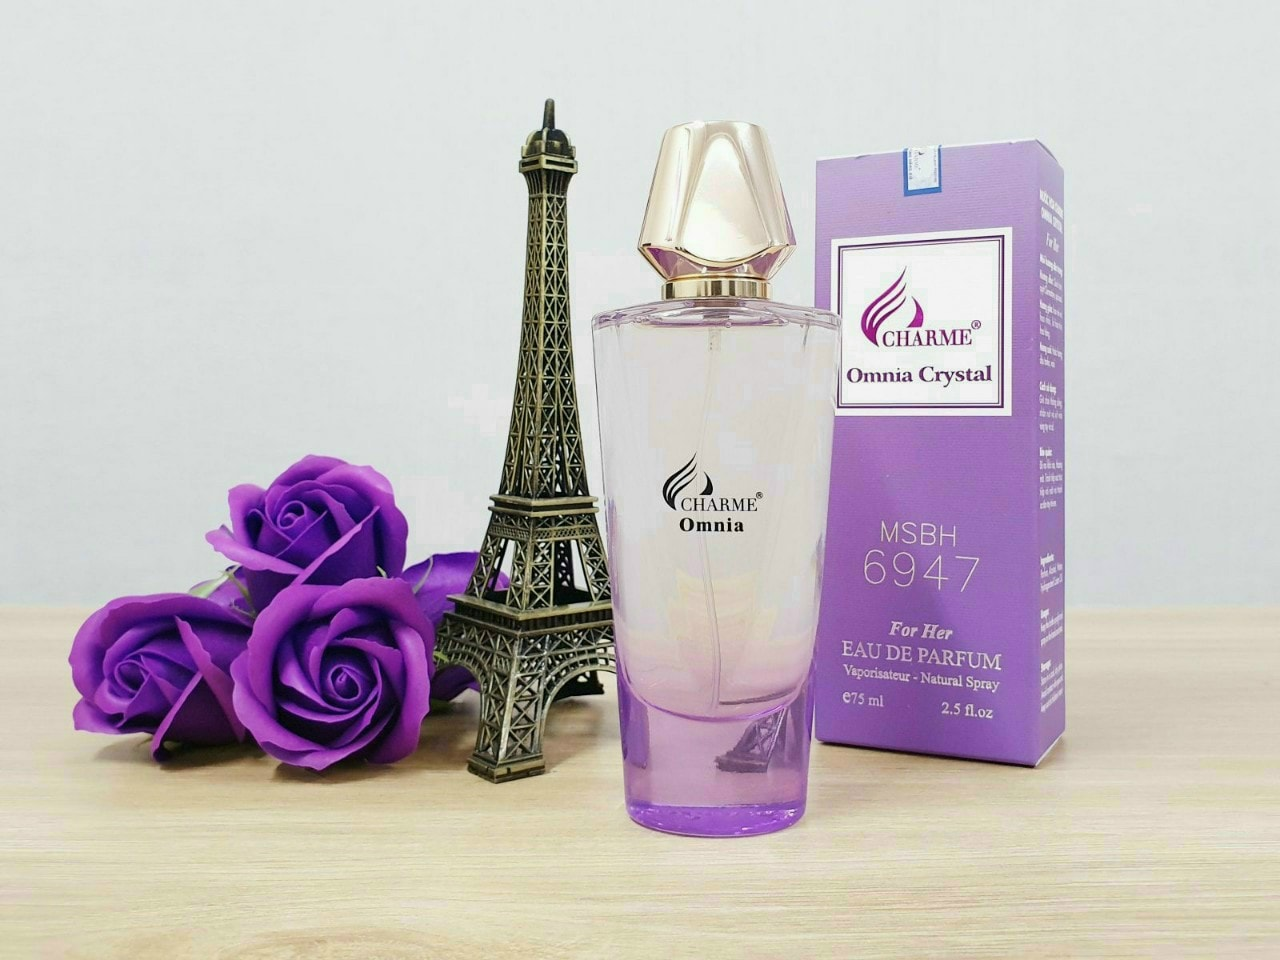 Nước hoa Charme Omnia Crystal 30ml